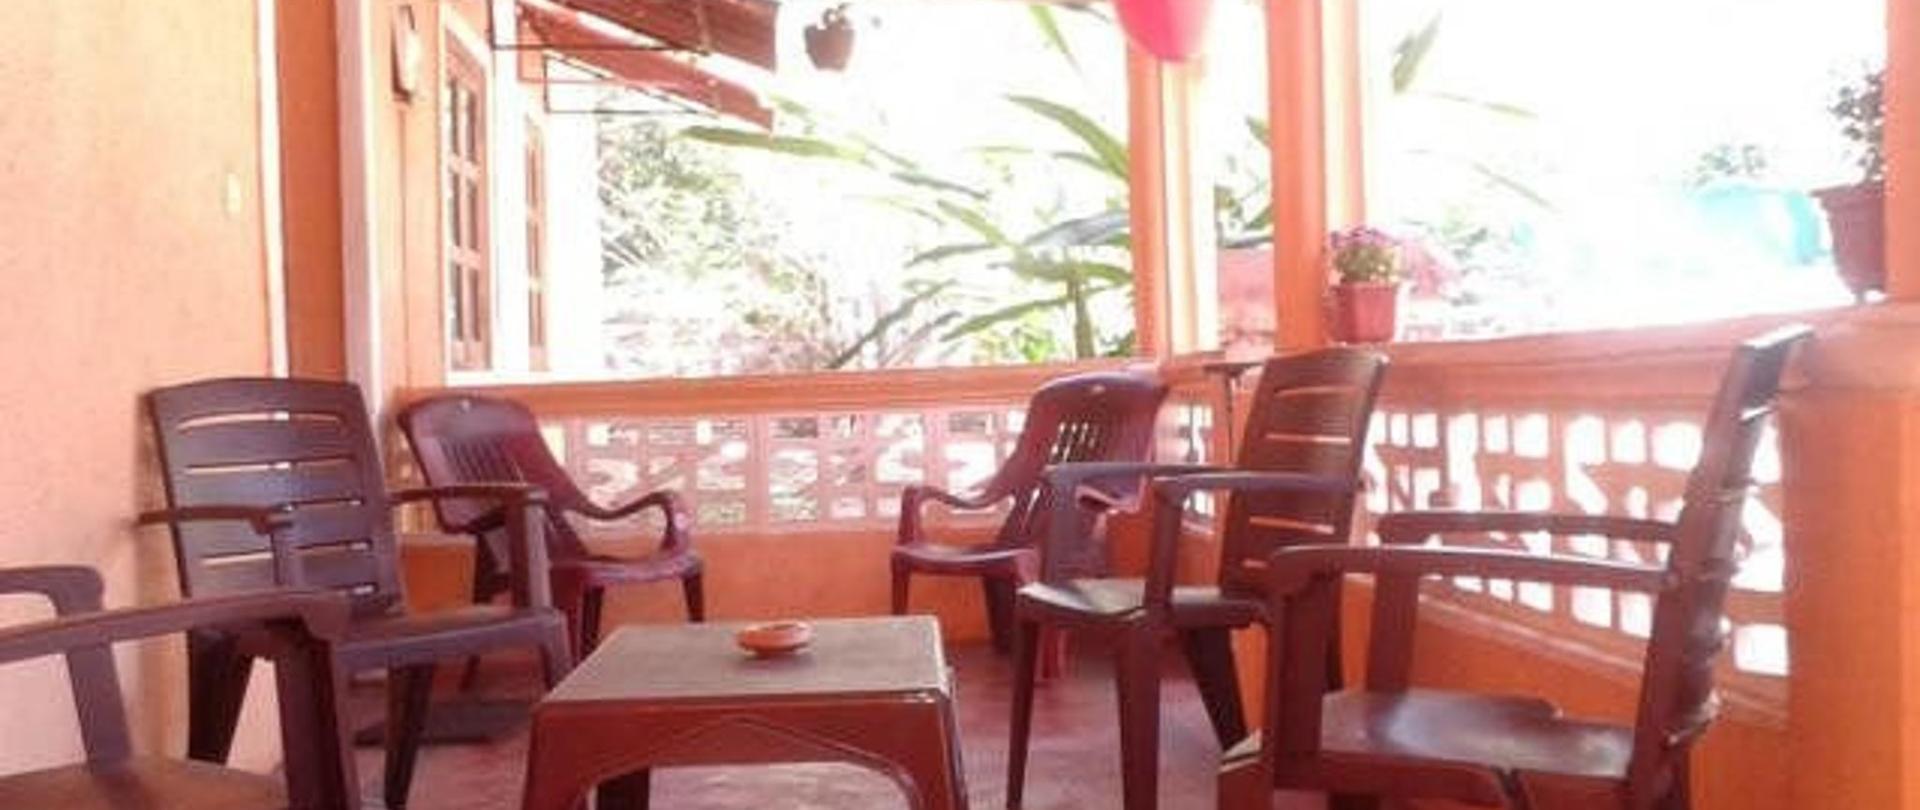 sitting-area-balcony.jpg